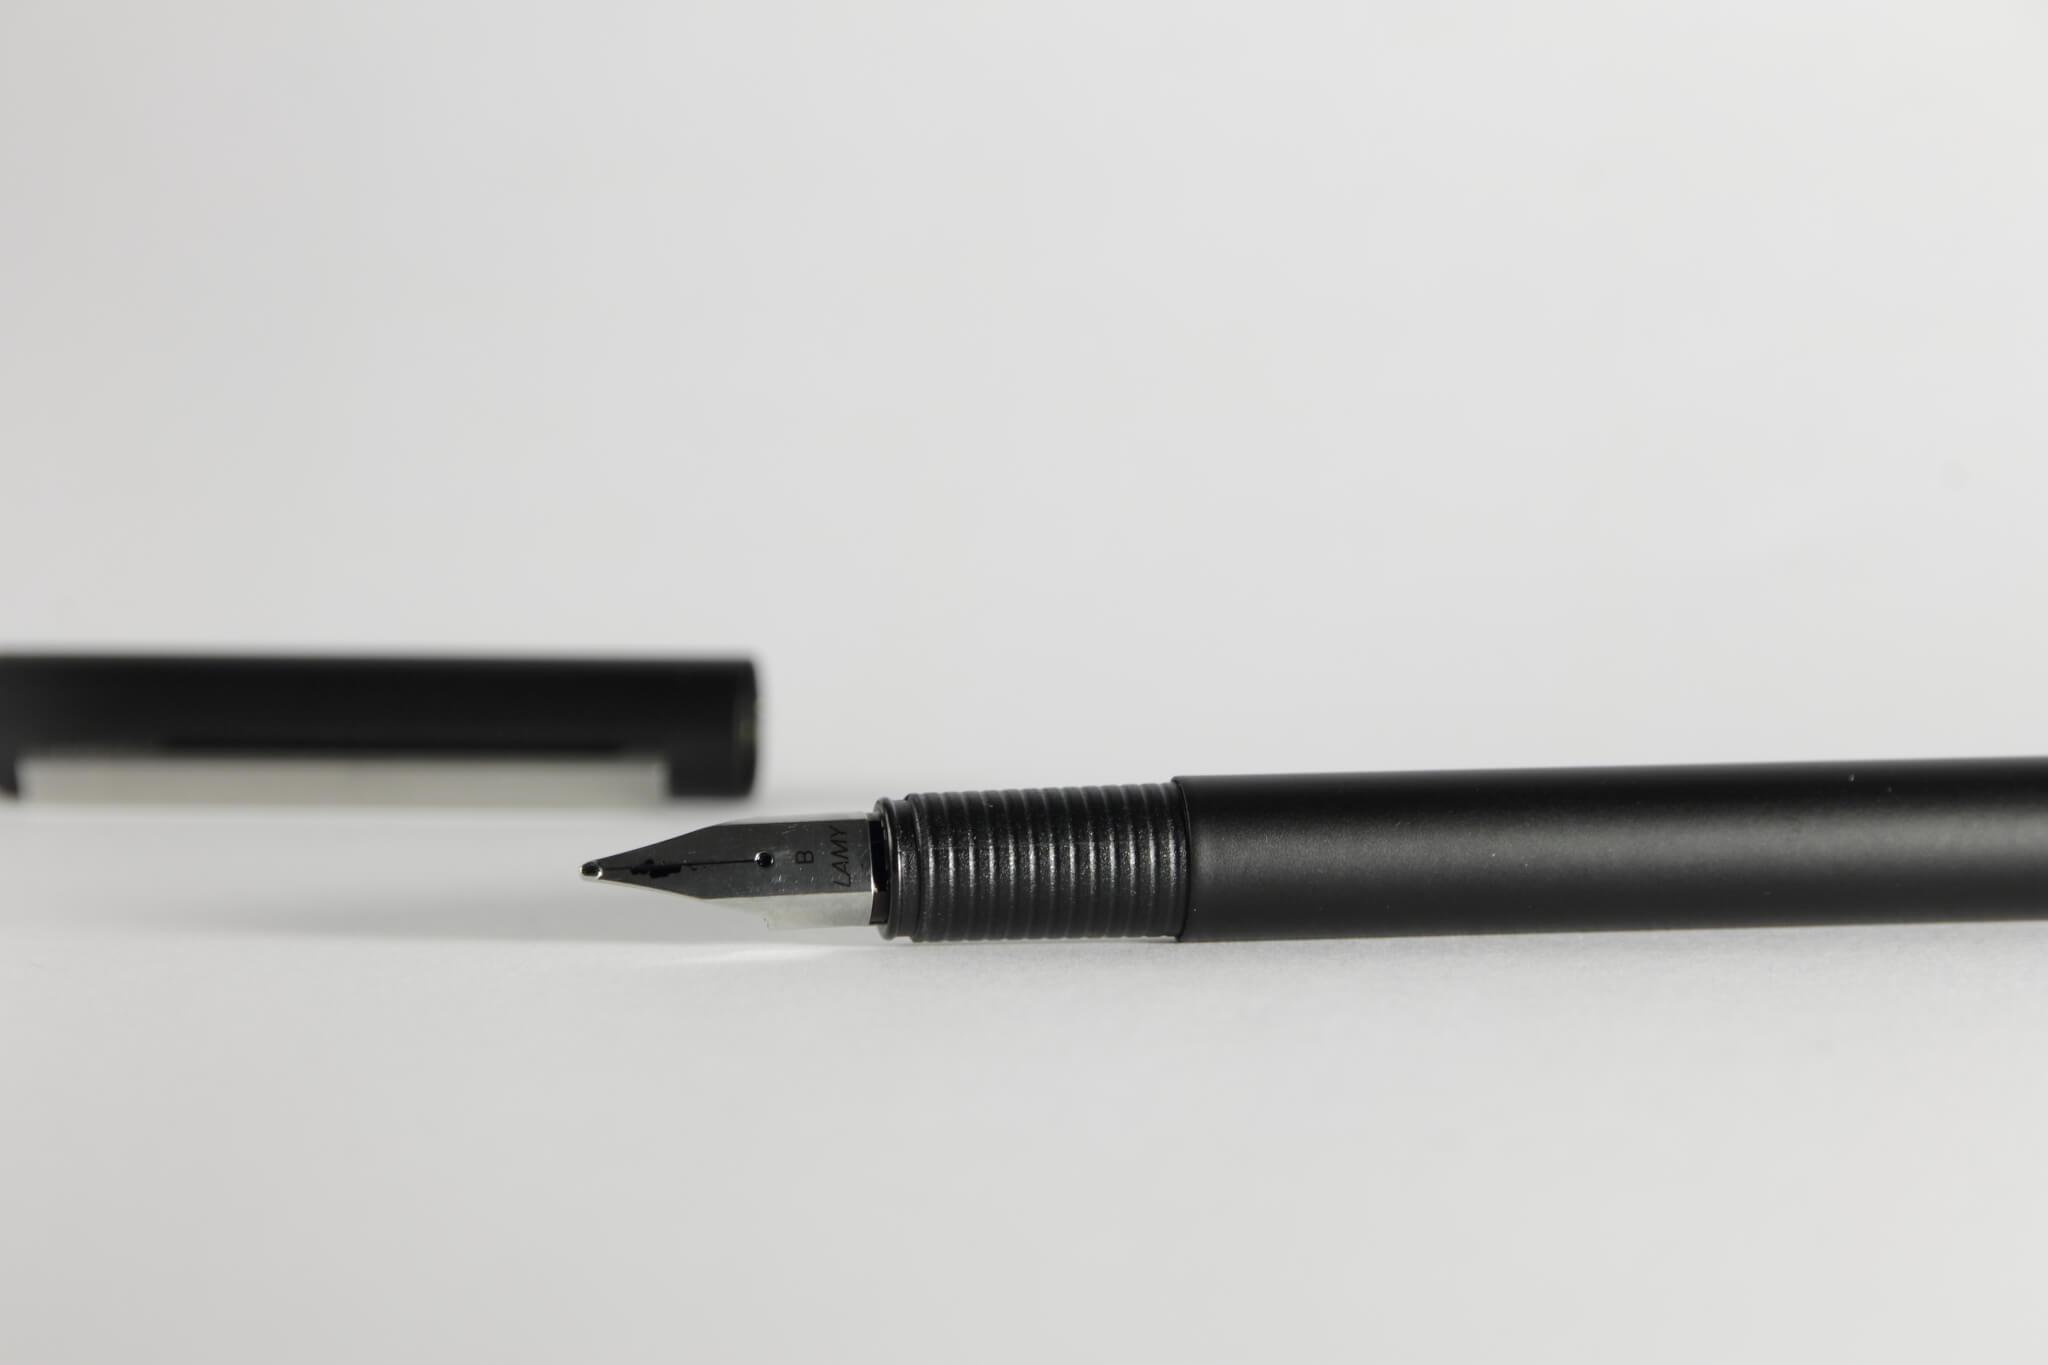 Lamy CP1 Fountain Pen Review - The Pen Company Blog: http://thepencompany.com/blog/pens/lamy-cp1